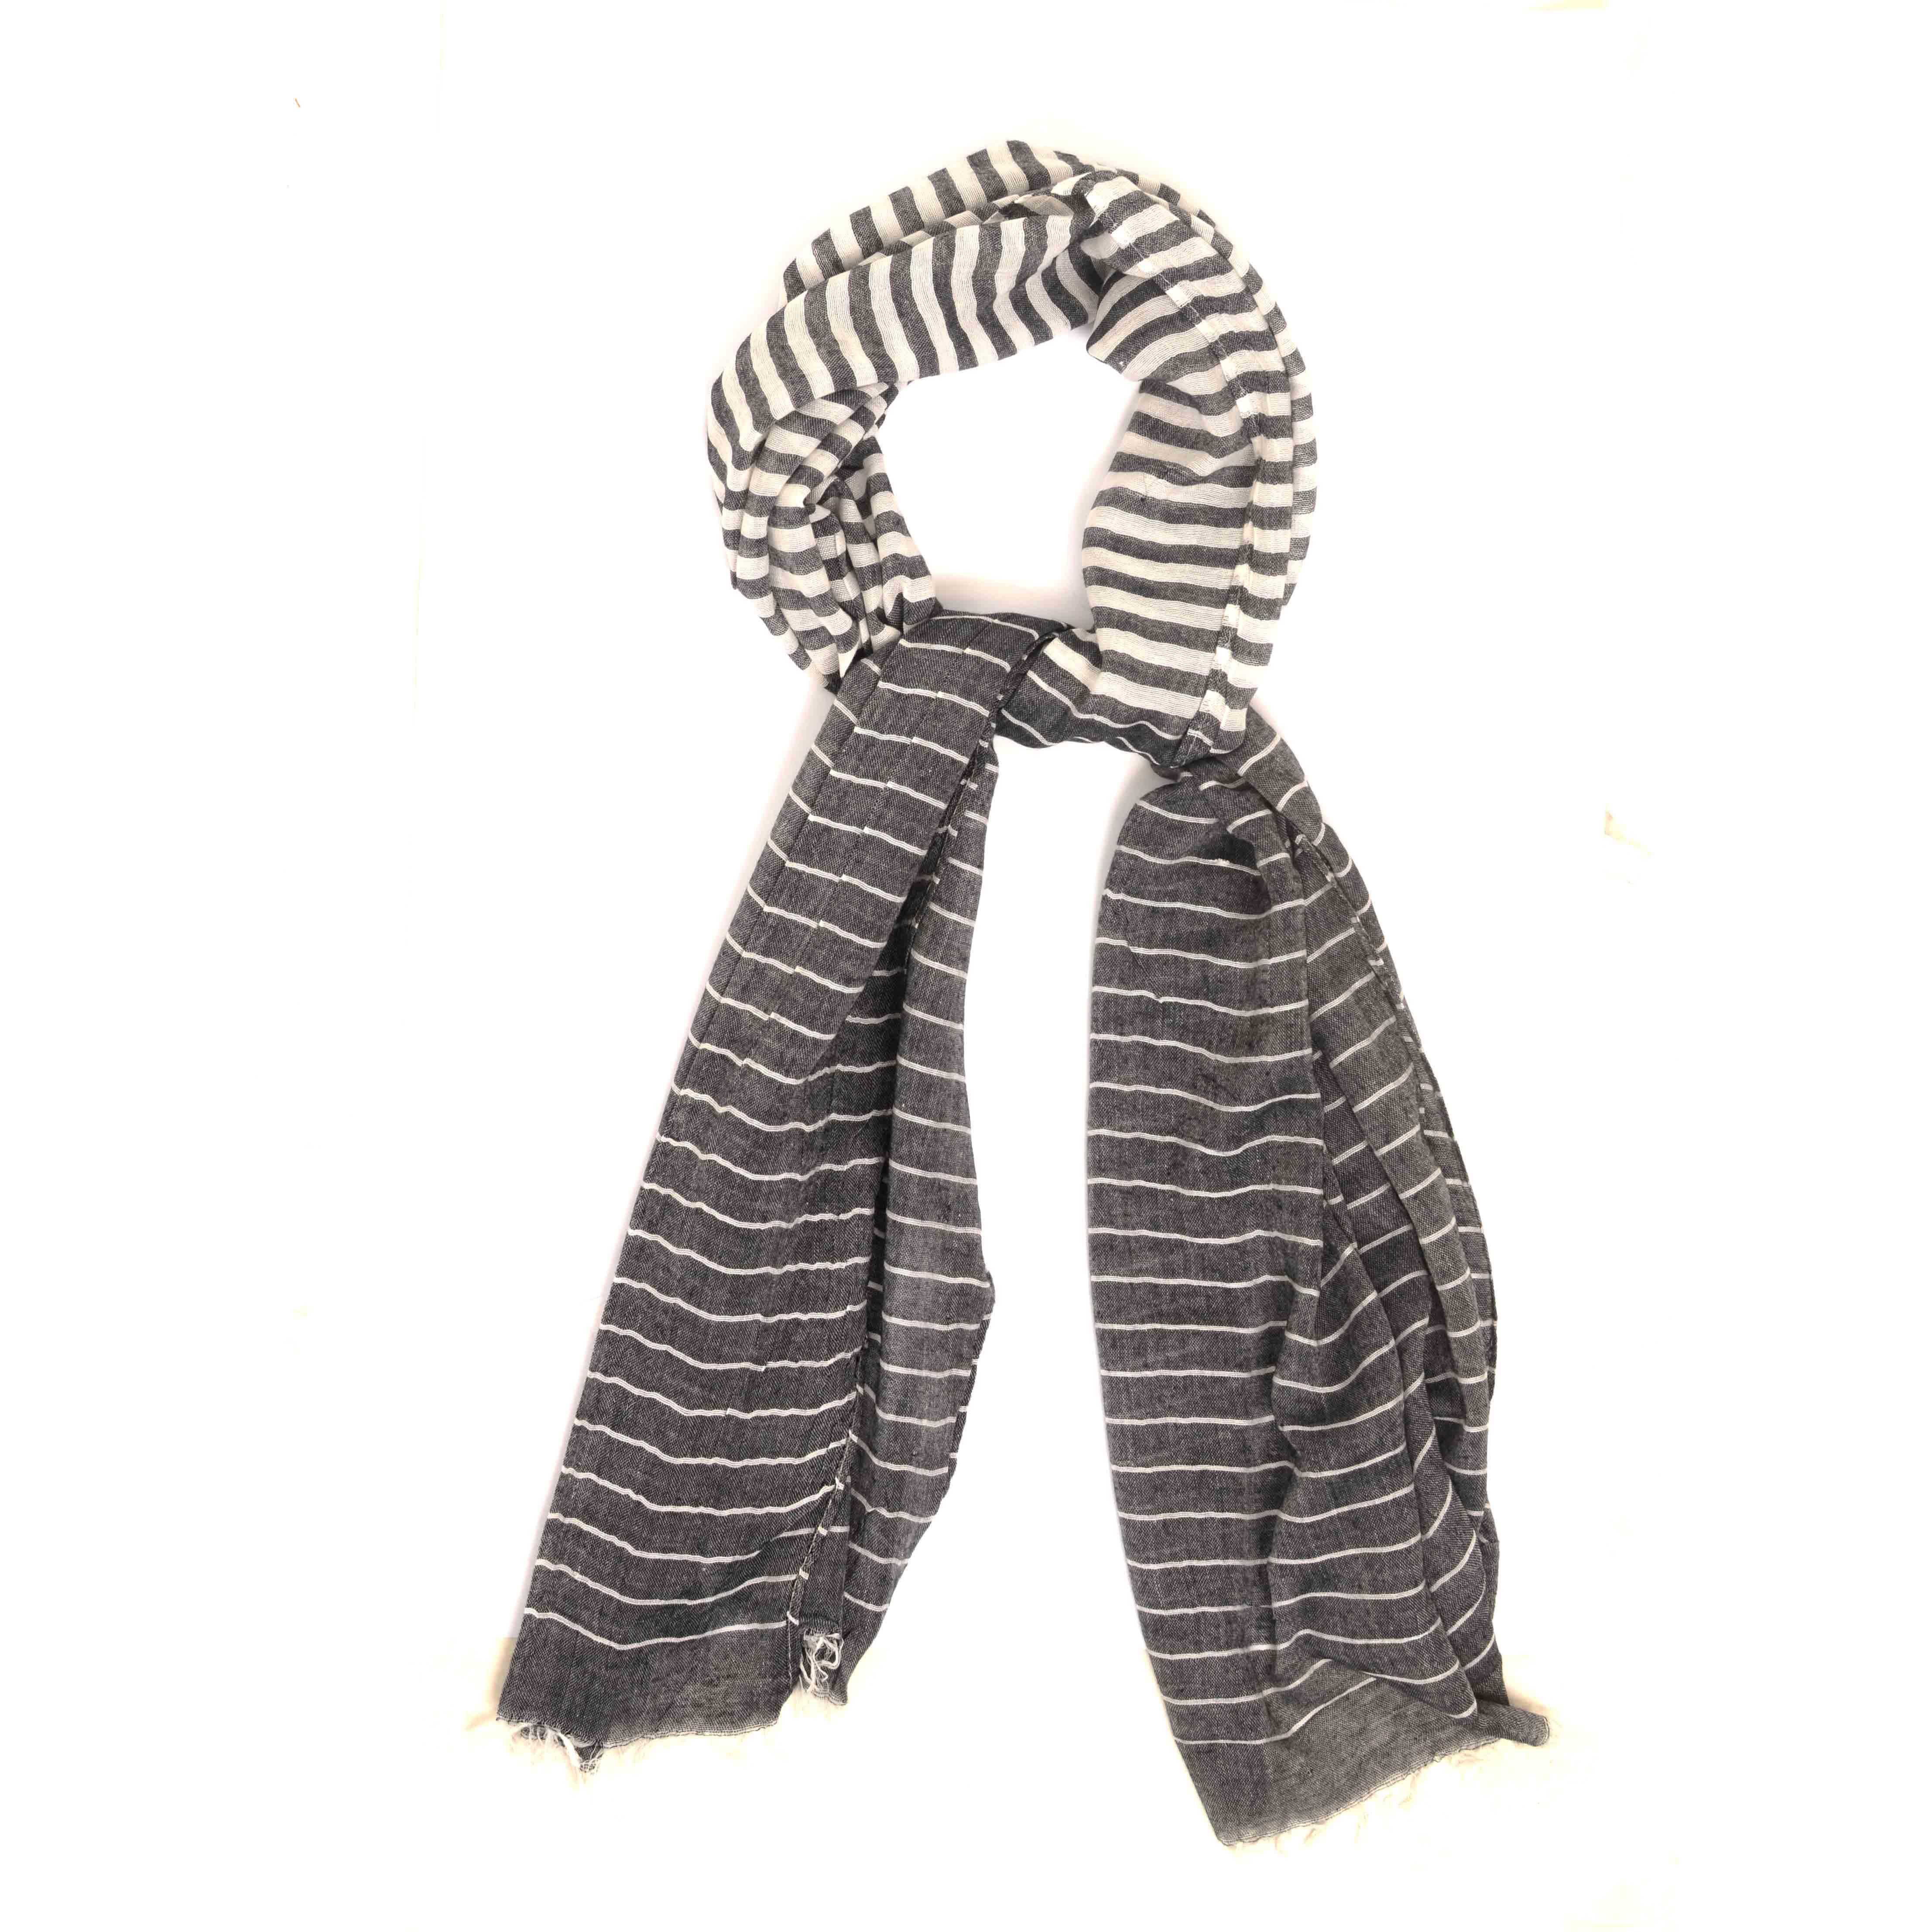 Maes   Scarf whit white stripe design in light grey